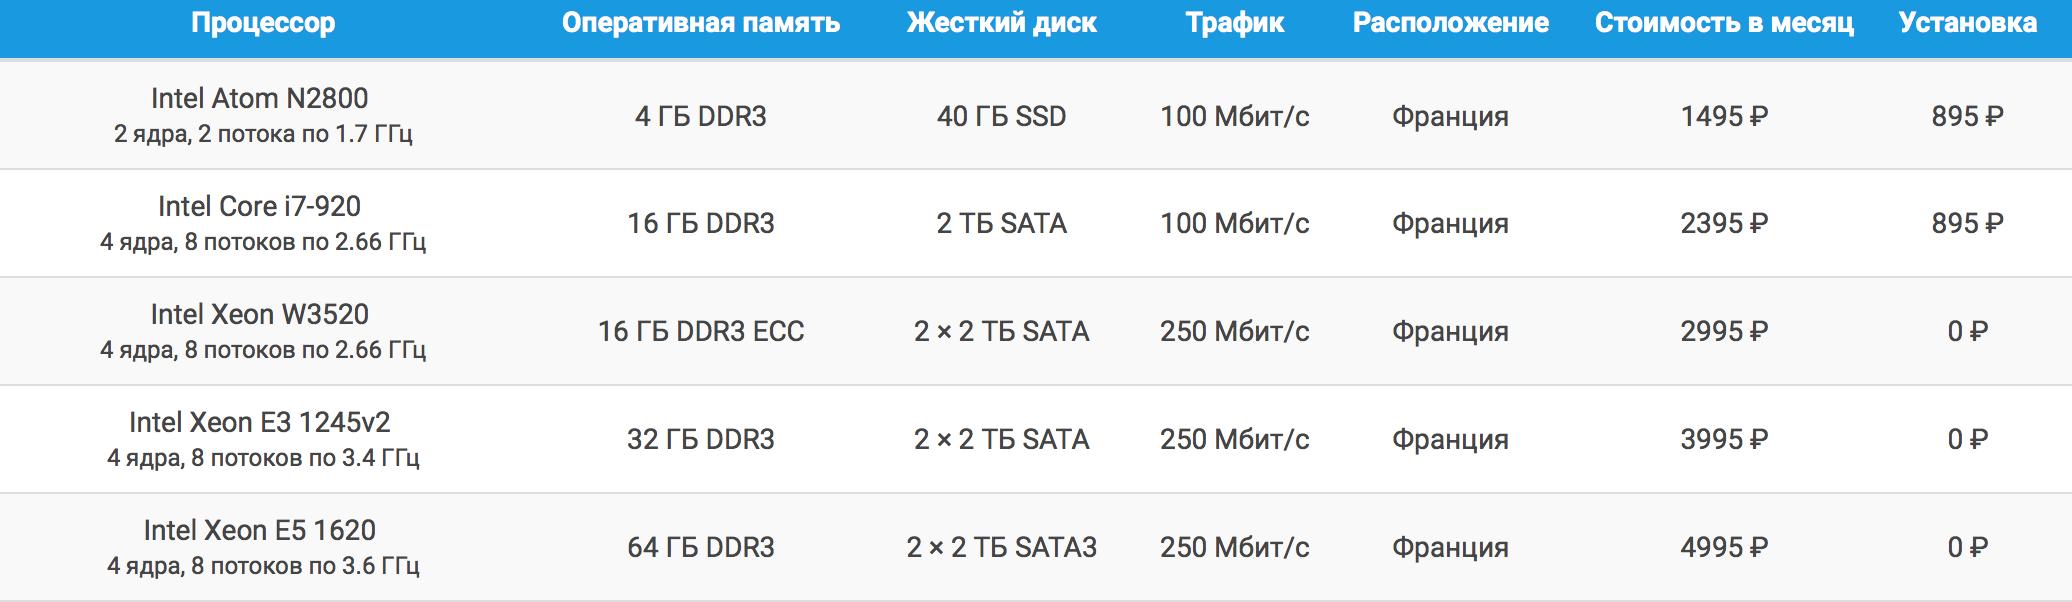 http://cpanel.skyhost.ru/static/franceservers.png